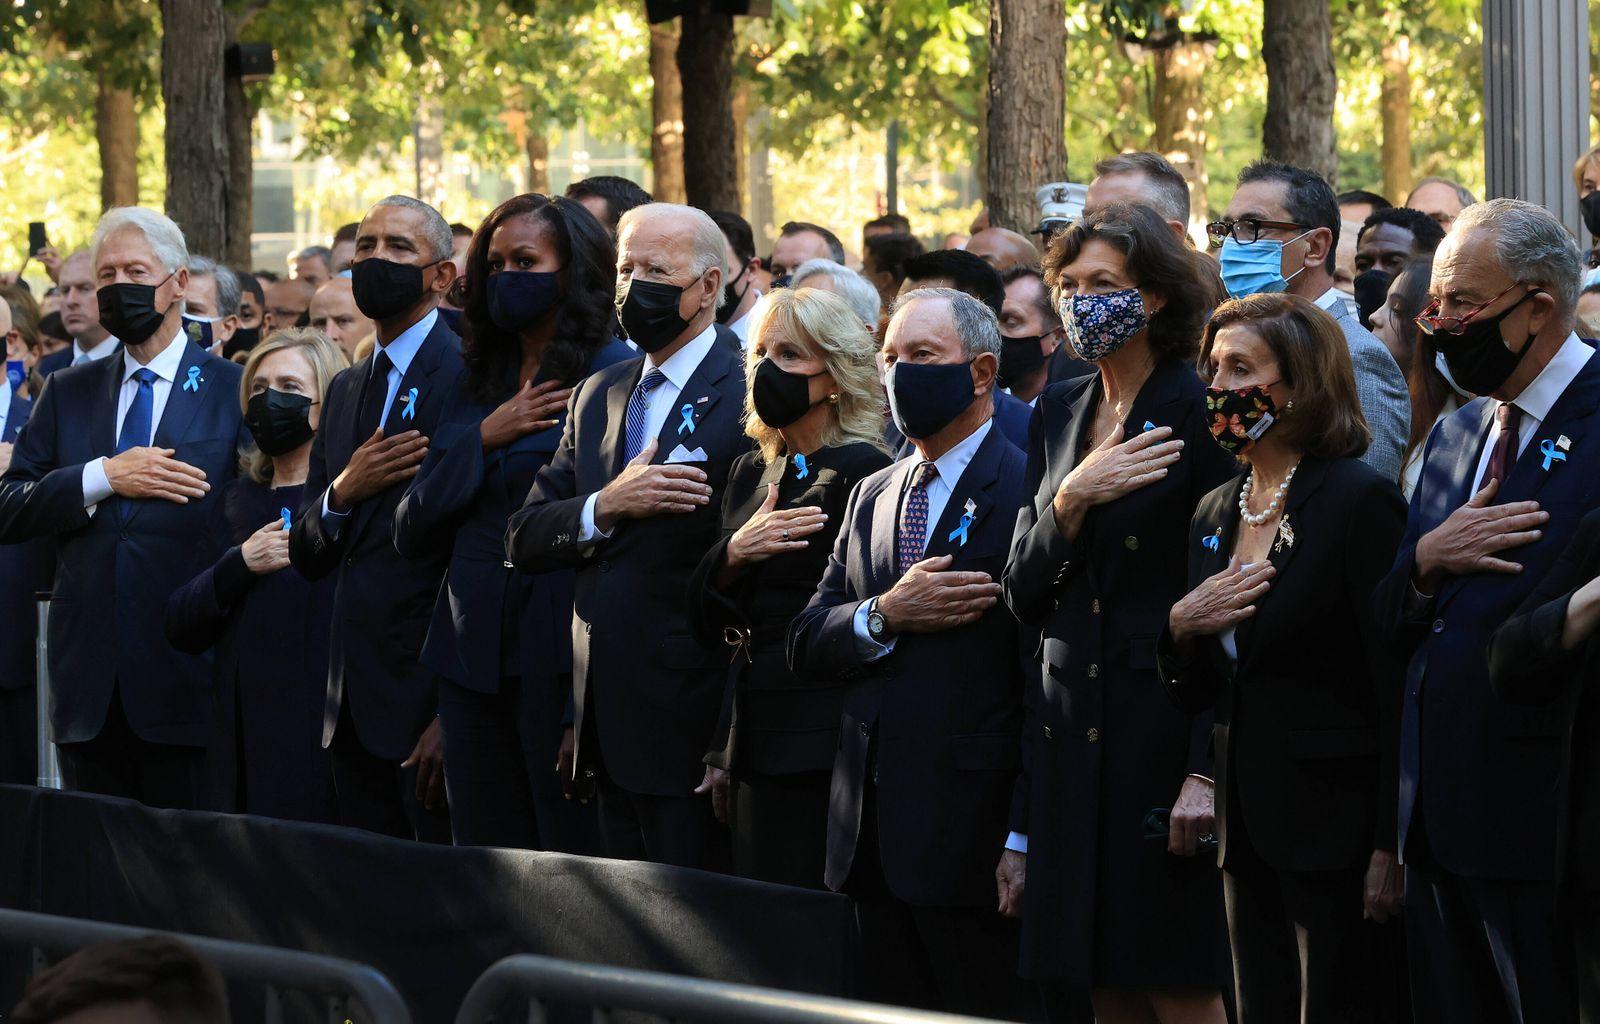 (L-R) Former President Bill Clinton, former First Lady Hillary Clinton, former President Barack Obama, former First Lad